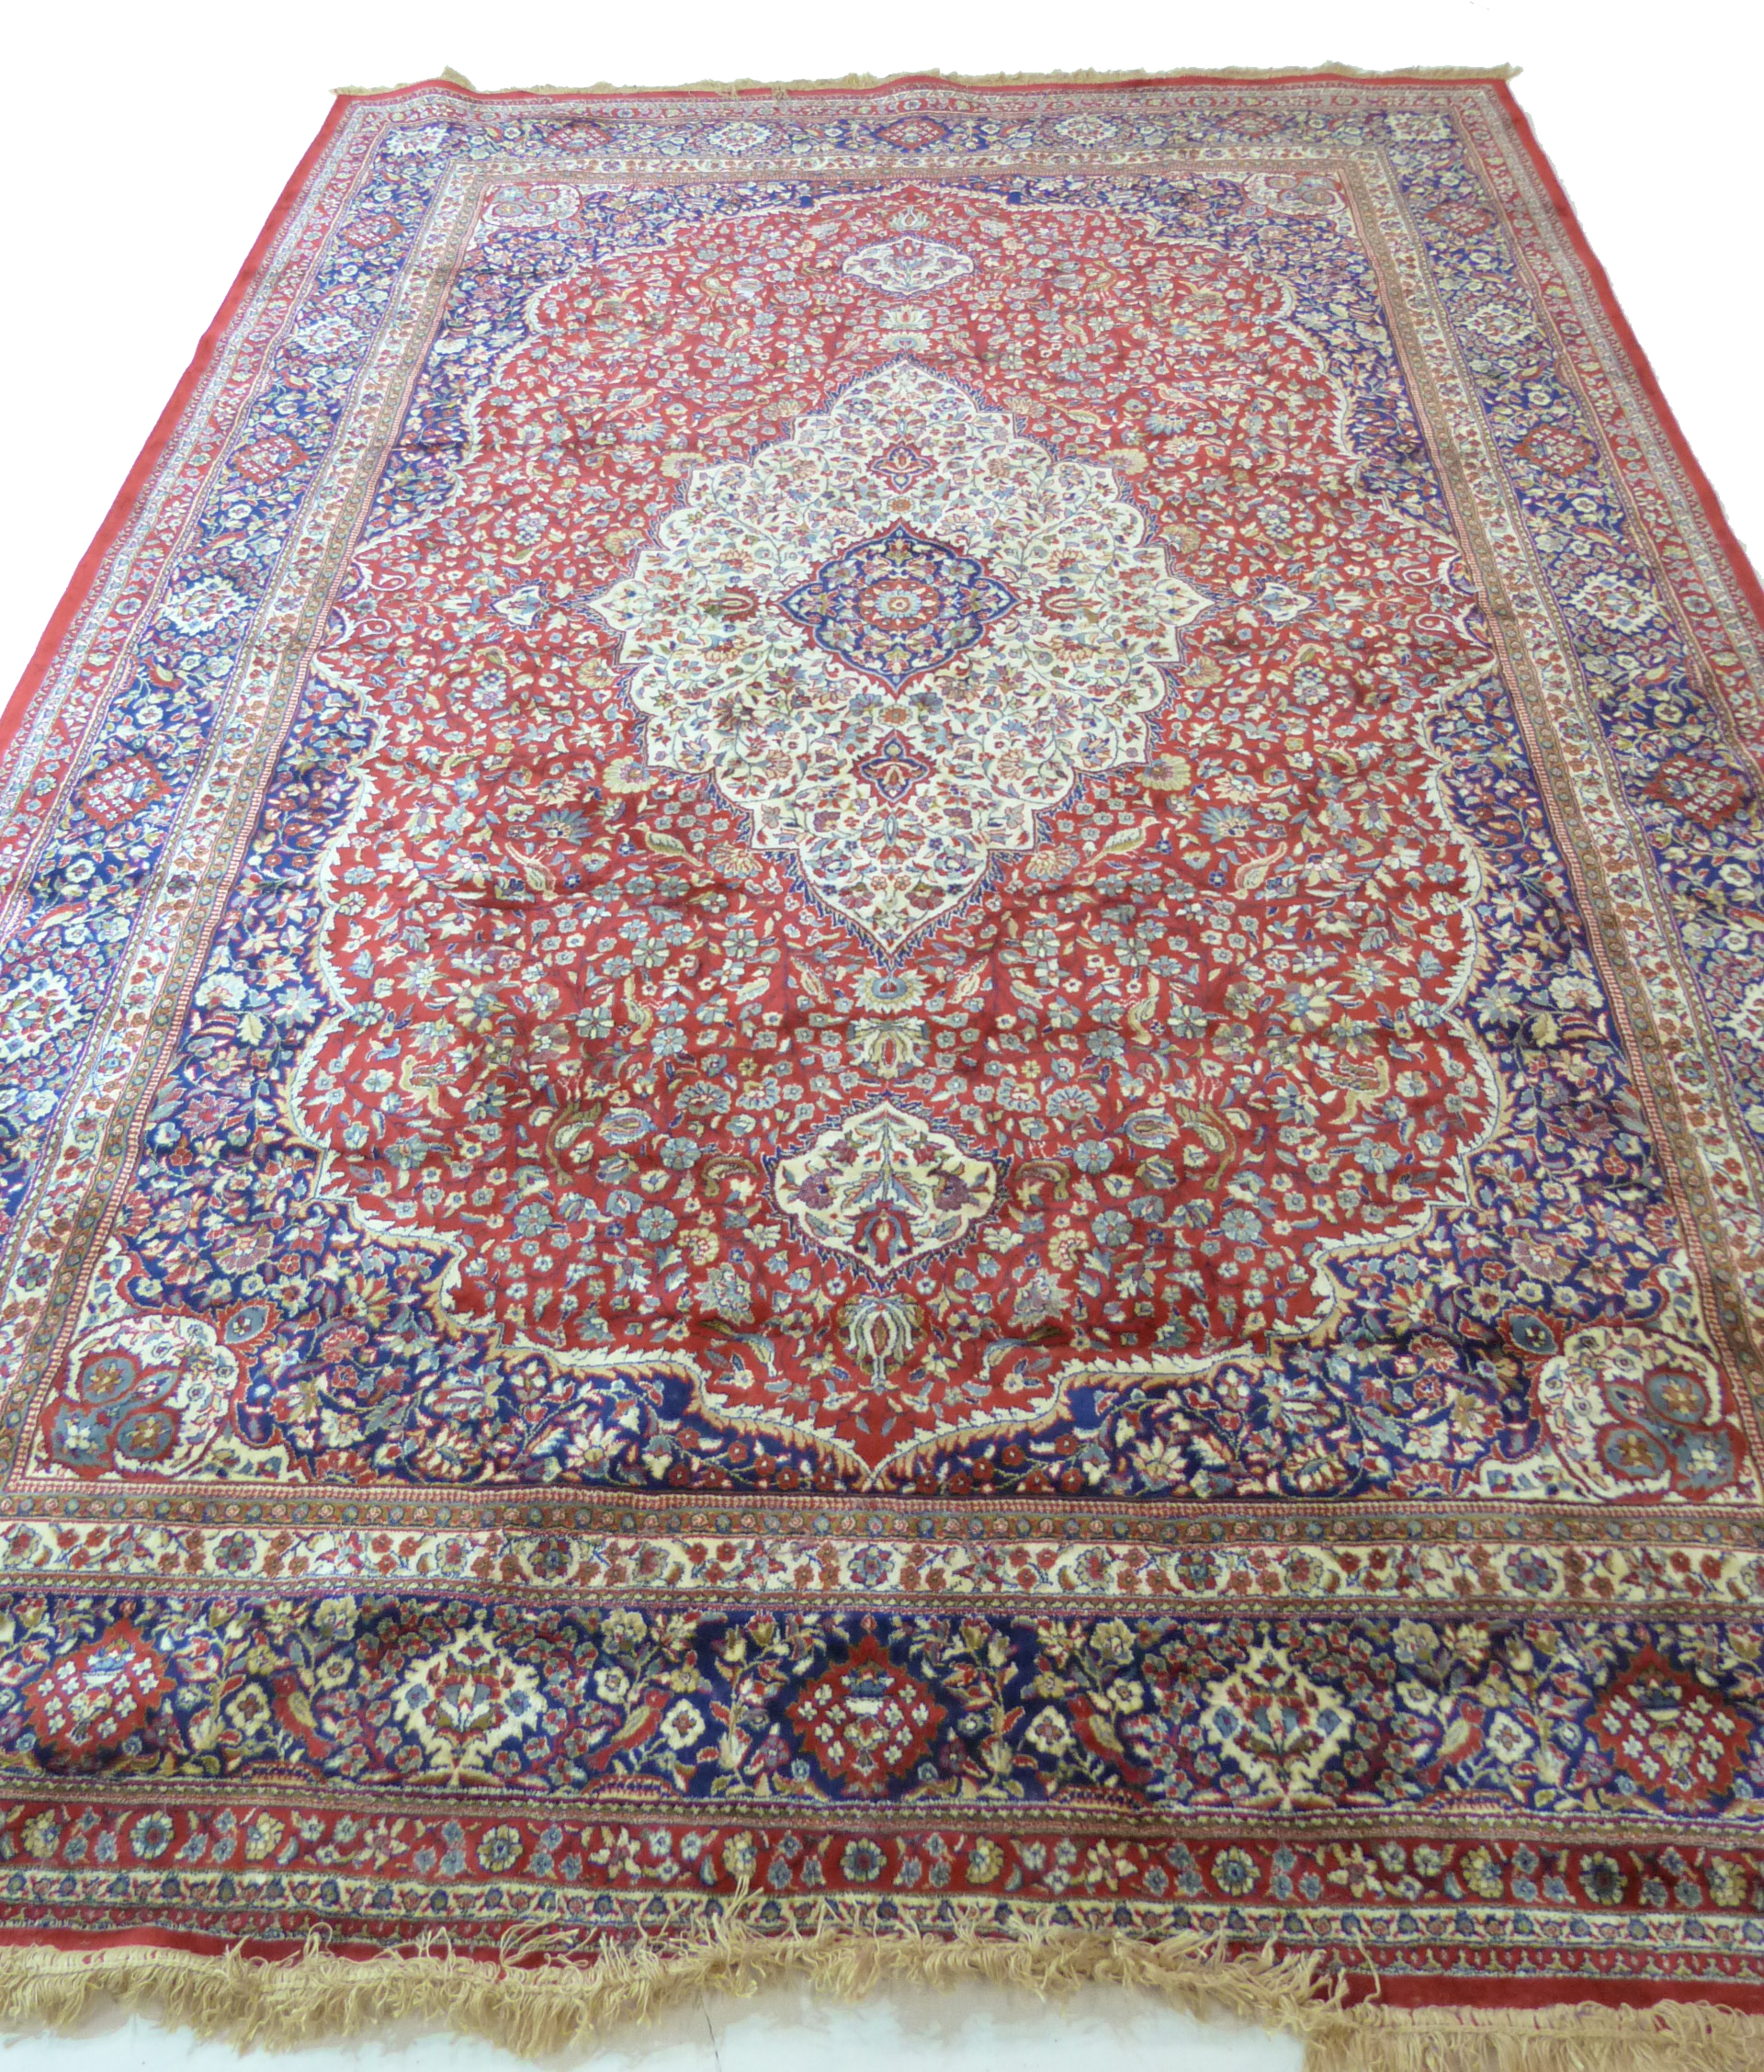 Large red ground full-pile Kashmir Carpet, floral medallion design, 340cm x 230 cm approx - Image 3 of 8